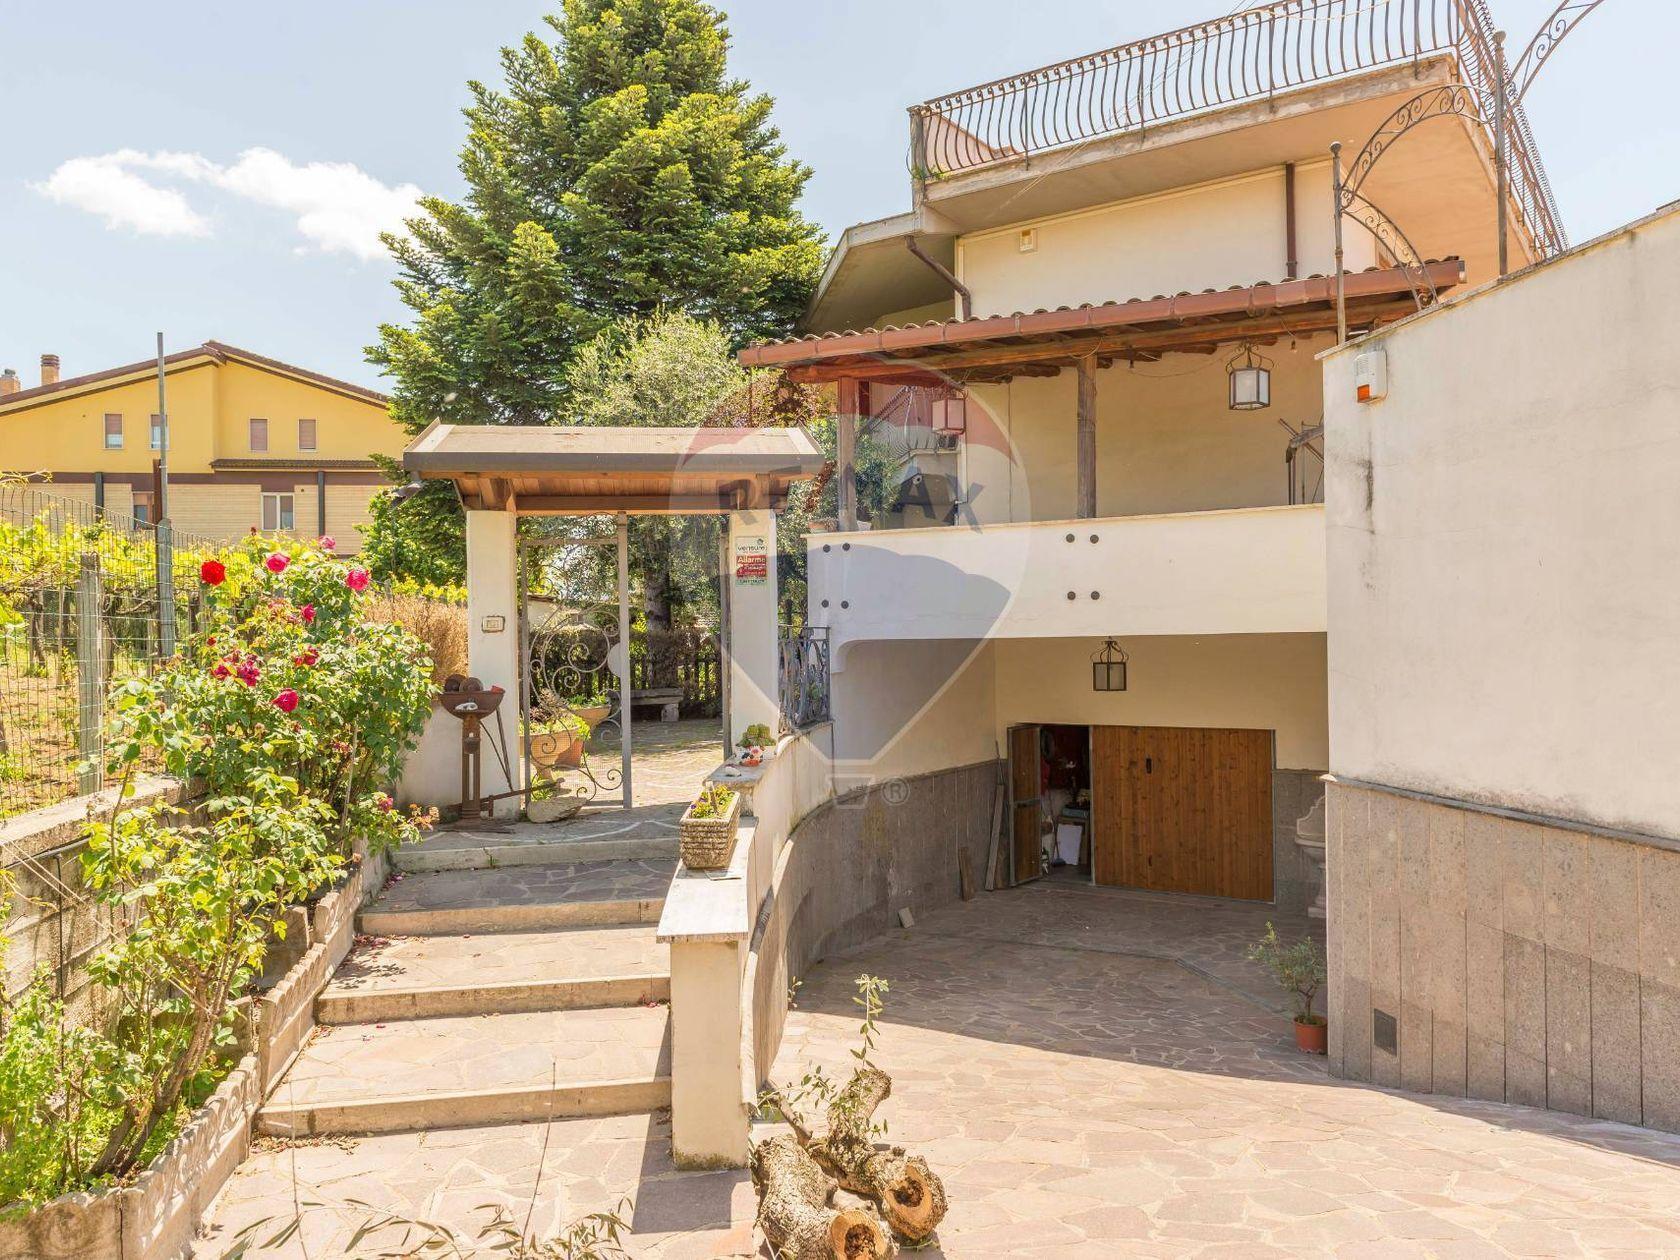 Villa singola Roma - Castelverde - Villaggio Prenestino, Roma, RM Vendita - Foto 55